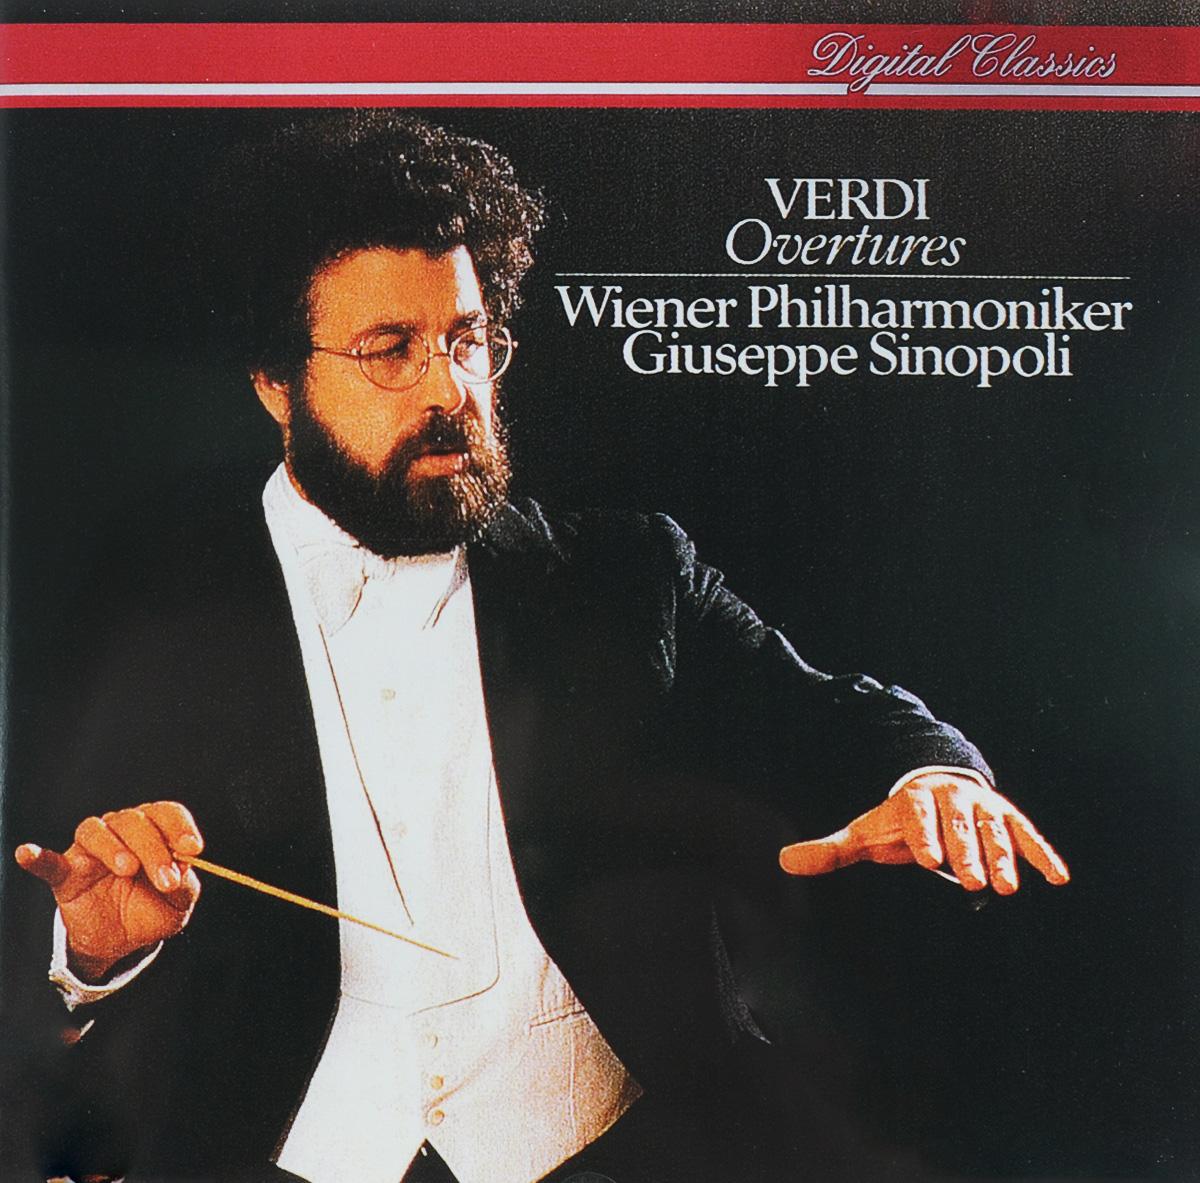 Джузеппе Синополи,Wiener Philharmoniker,Vienna Philharmonic Orchestra Giuseppe Sinopoli. Verdi. Overtures giuseppe verdi falstaff